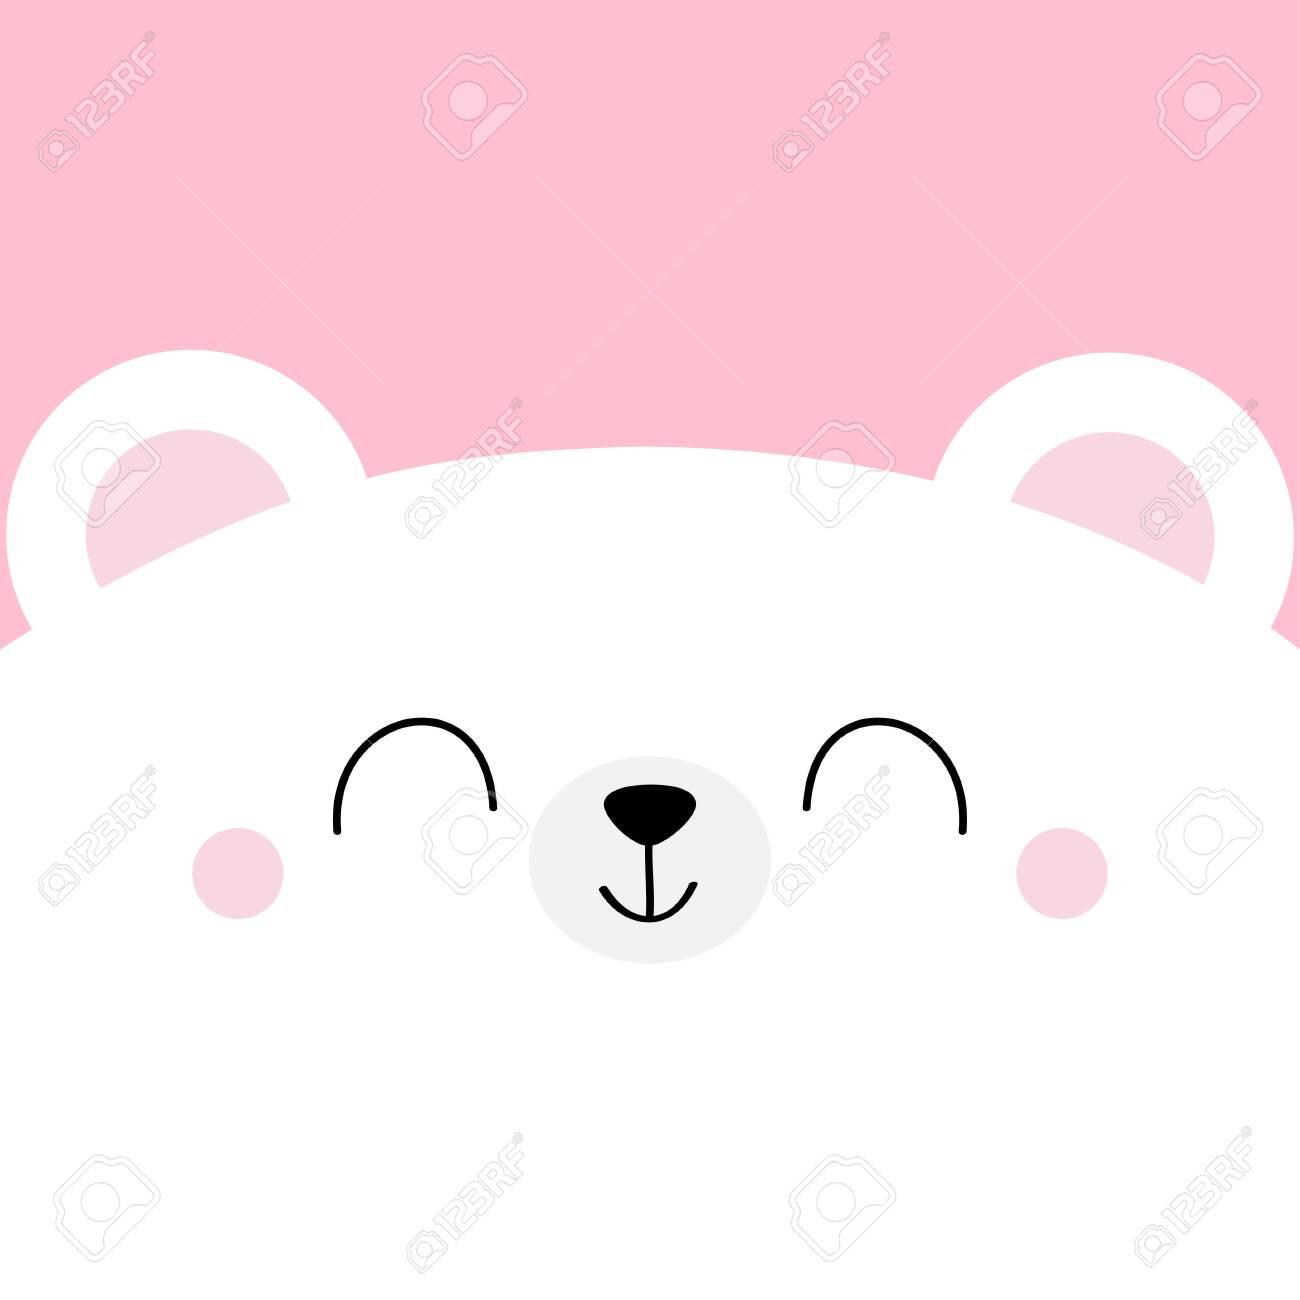 Clip Art in 2020 | Teddy bear clipart, Bear clipart, Art and craft videos